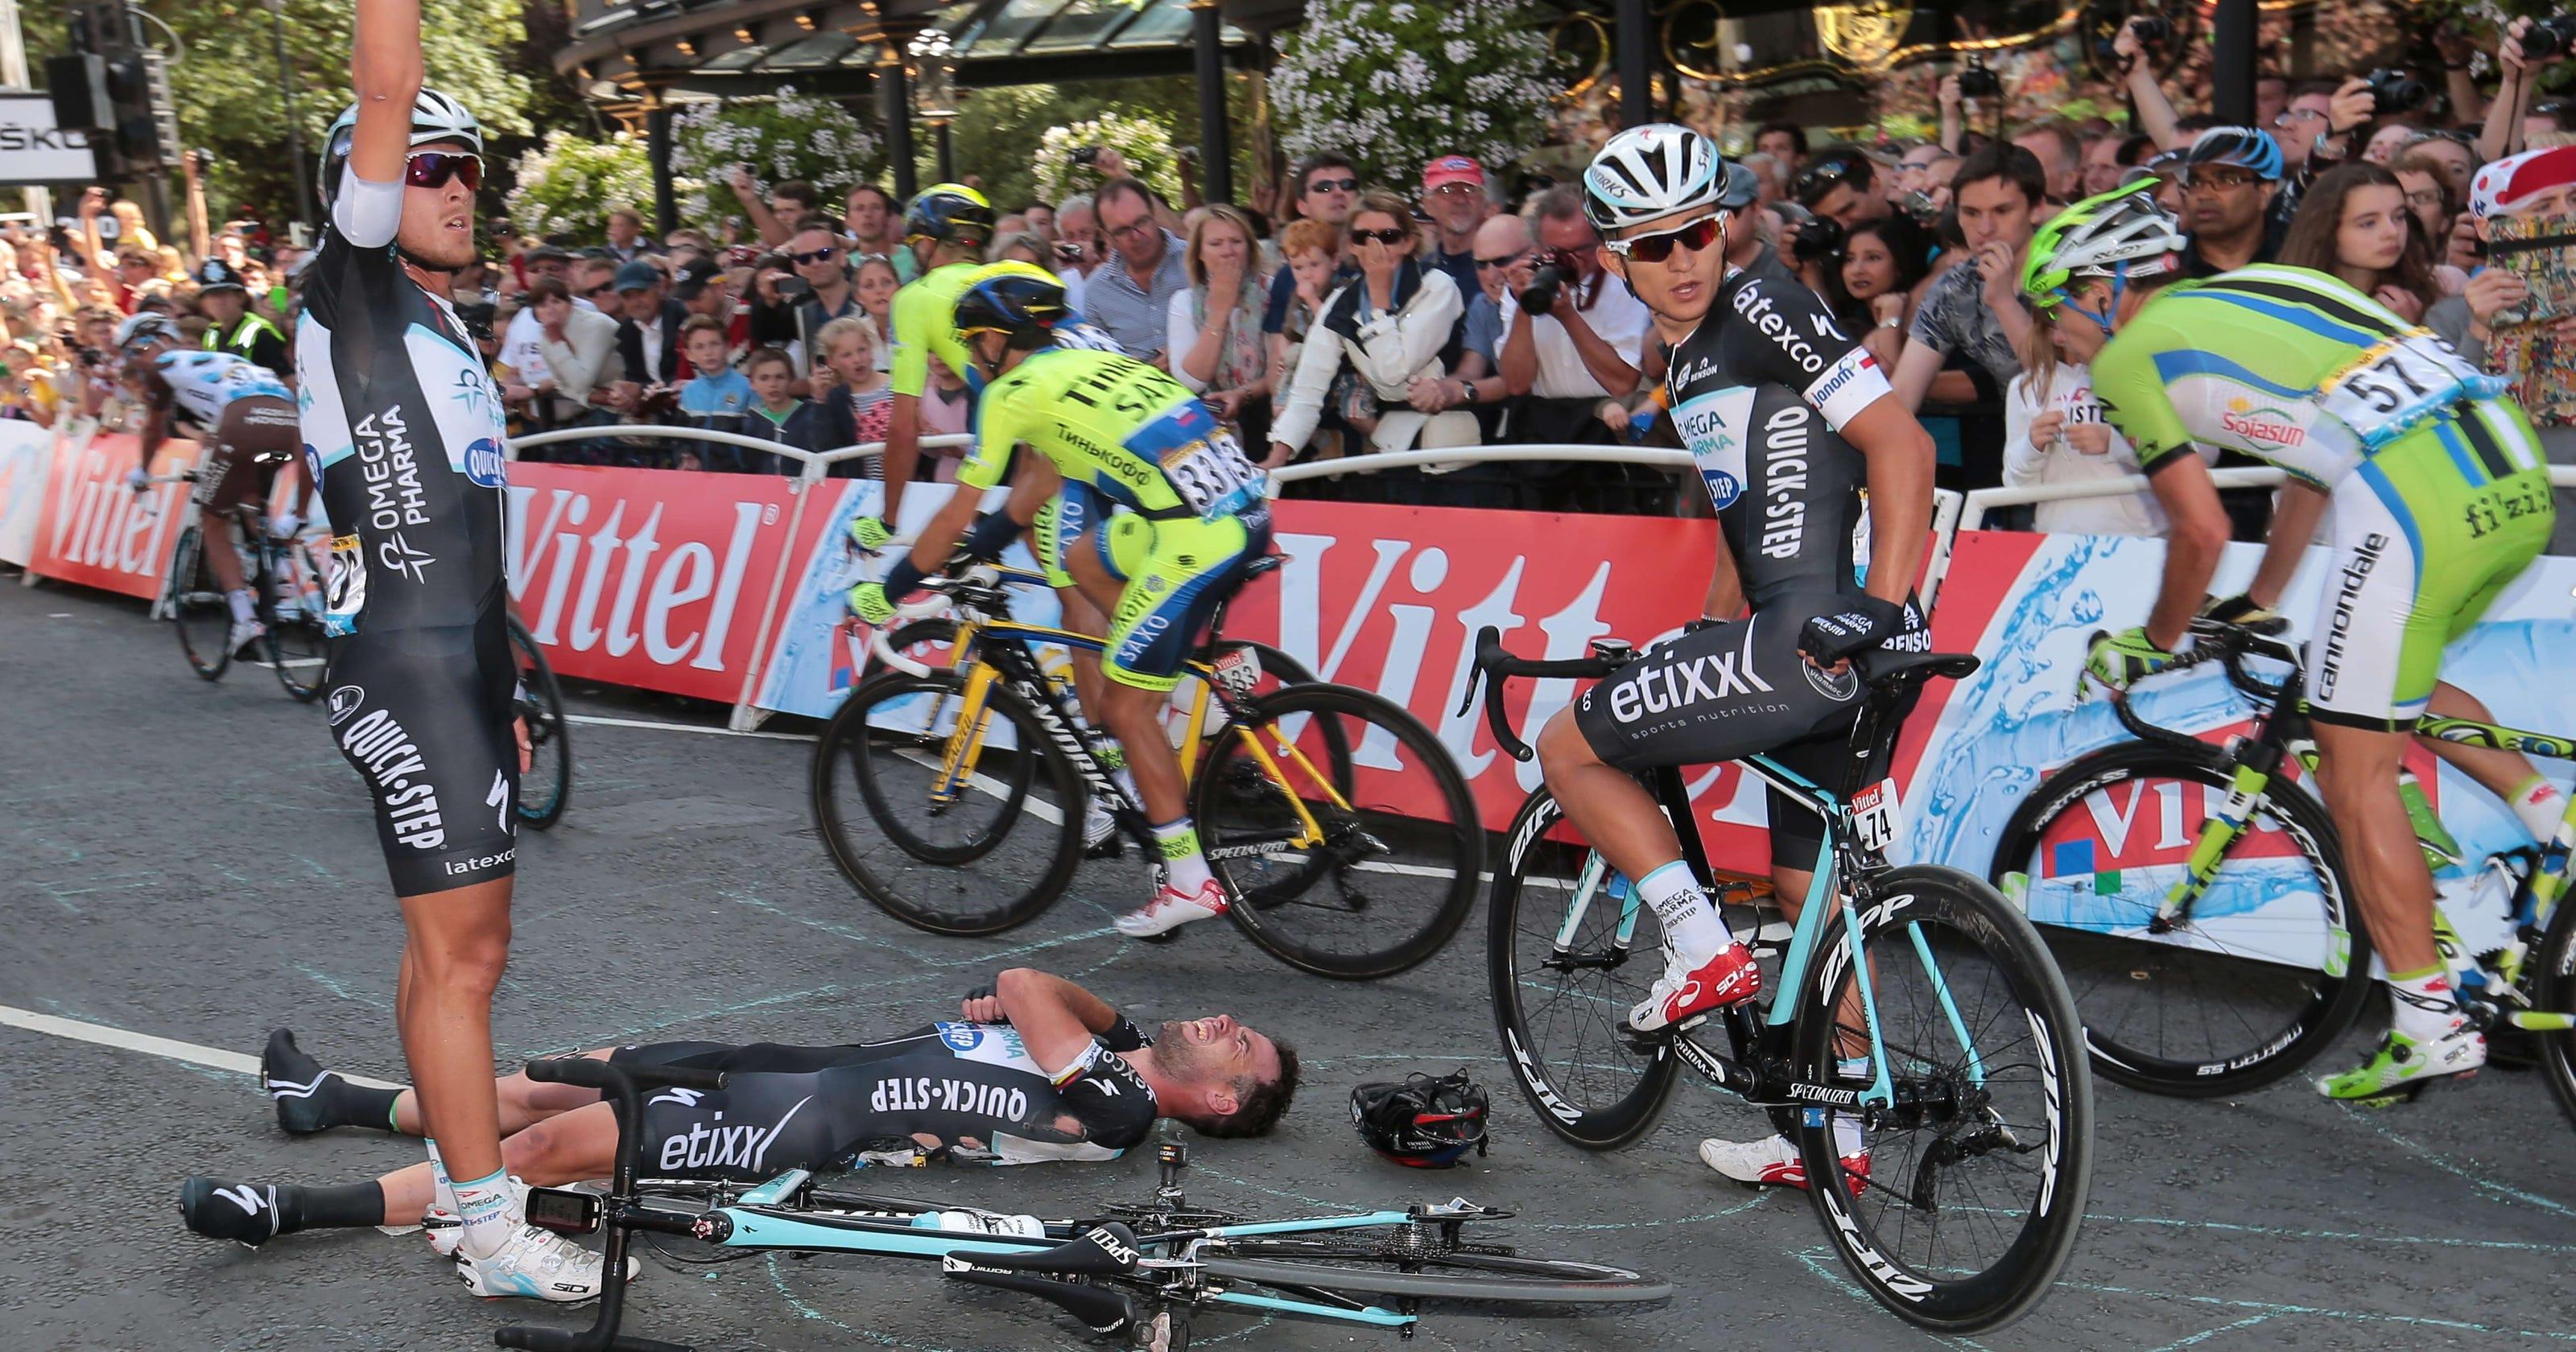 Marcel Kittel wins Tour de France s first stage d3f9d75b6